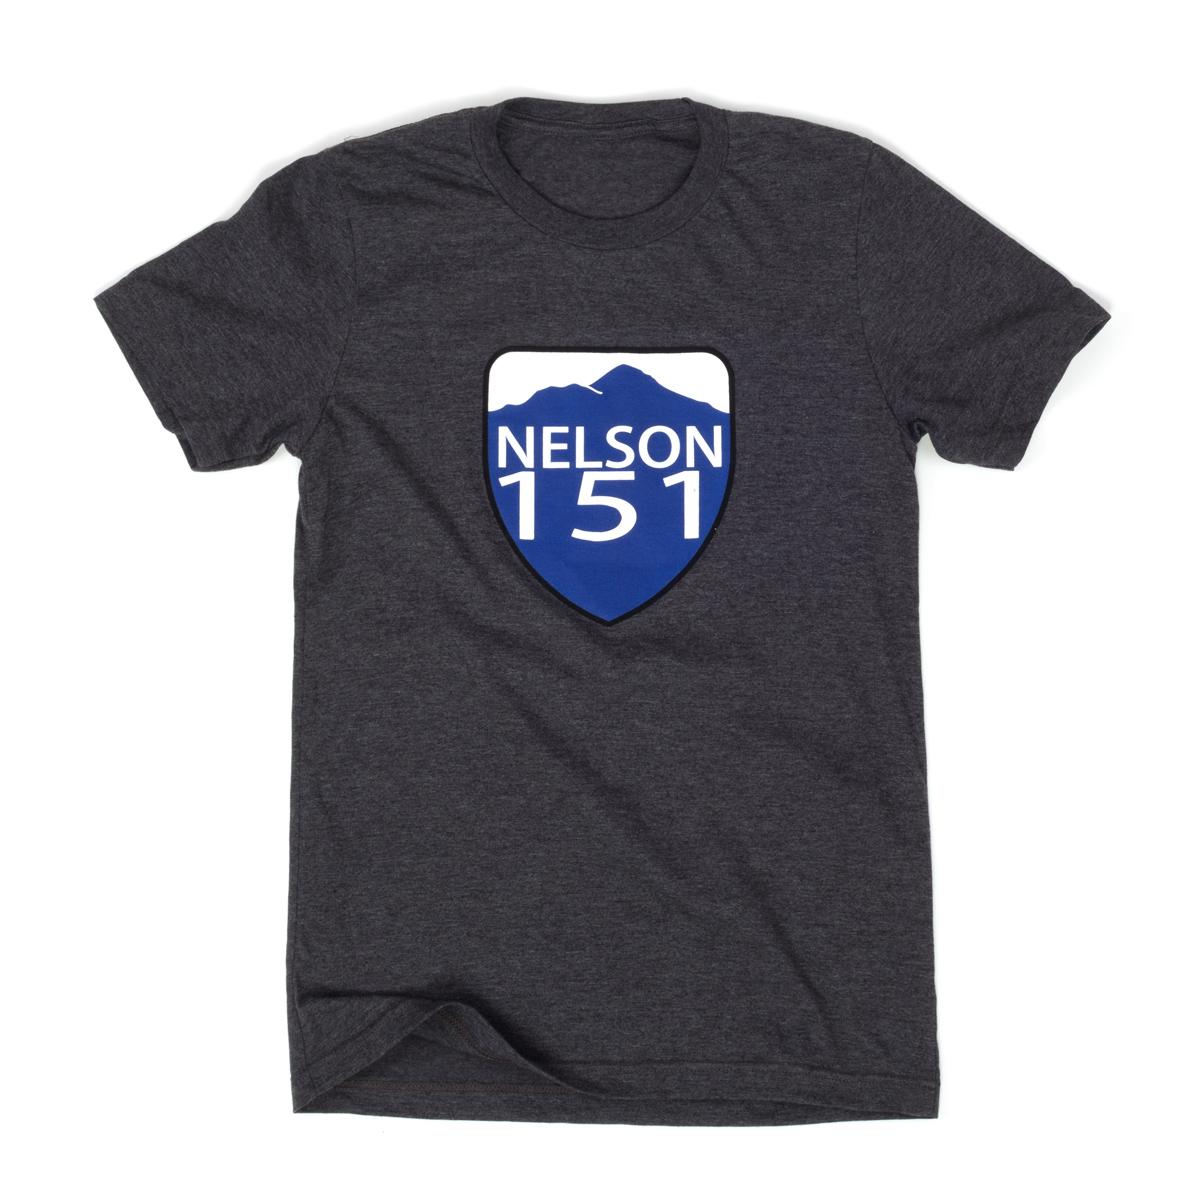 Nelson 151 Jersey Tee